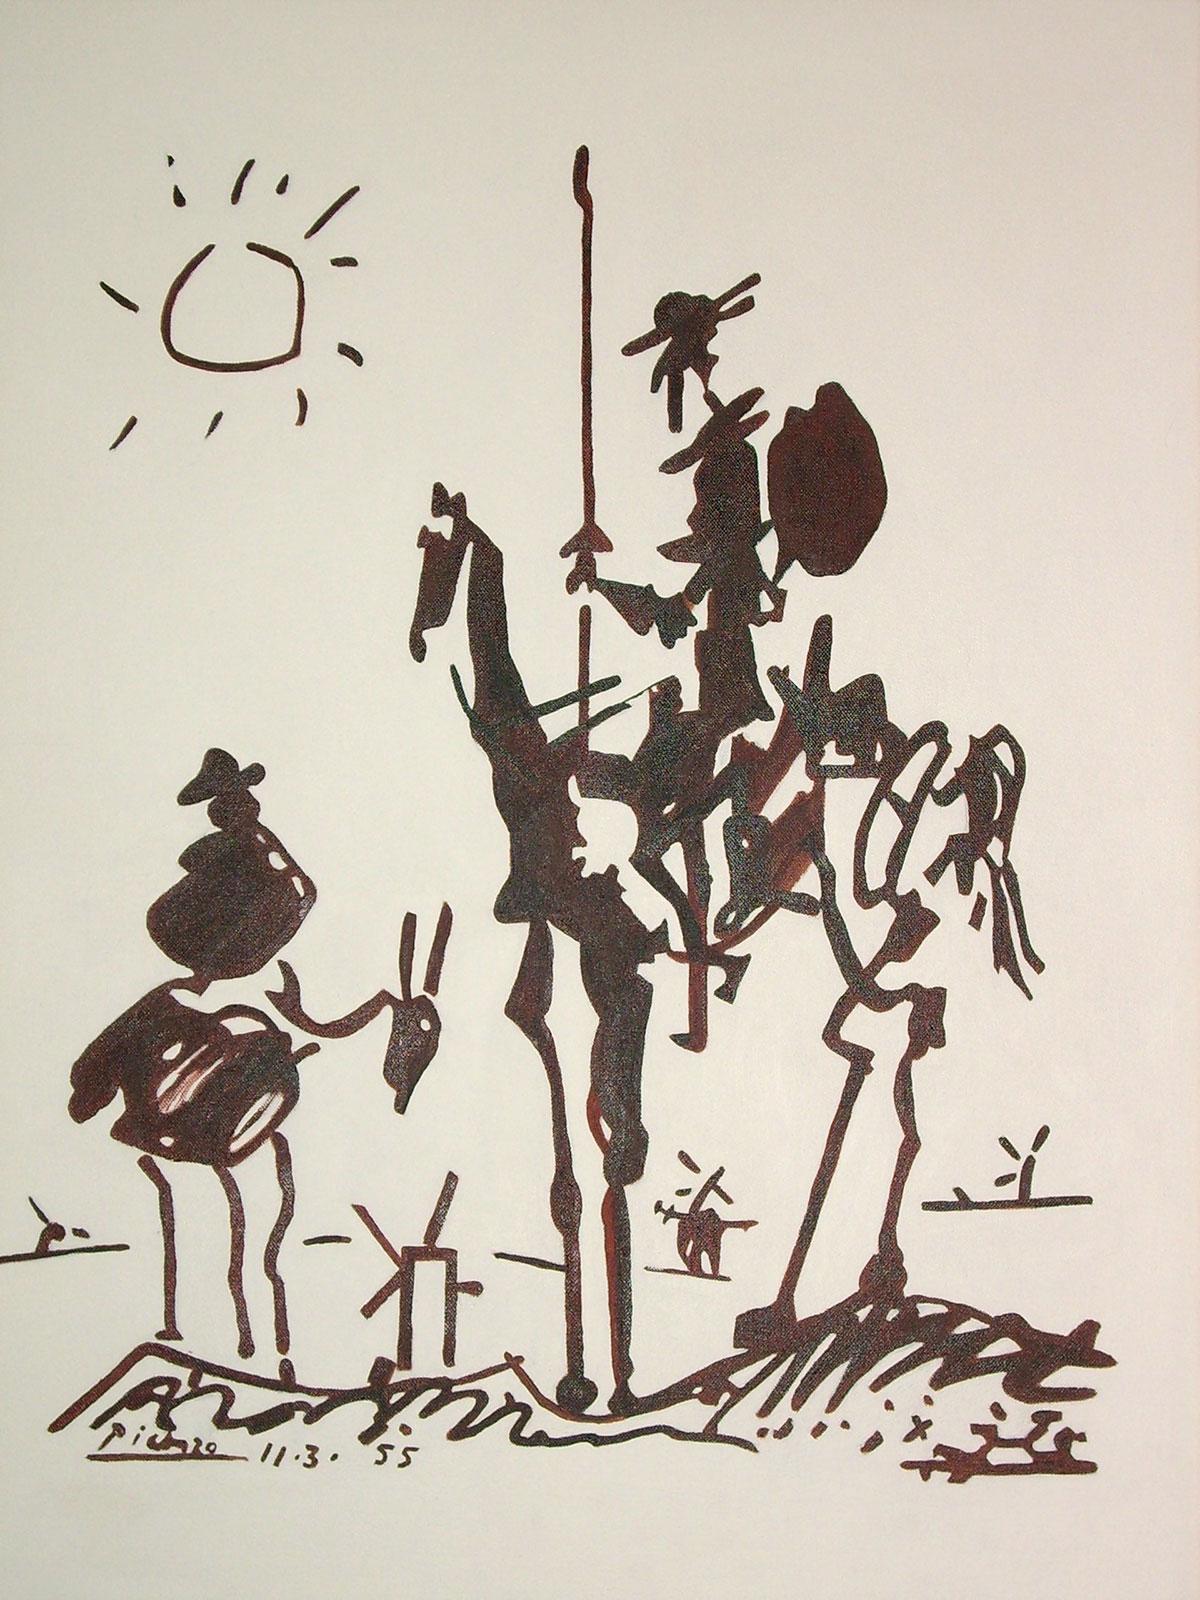 Lovely By Pablo Picasso Don Quixote Picasso Don Quixote Lithograph Picasso Don Quixote Plate houzz-03 Picasso Don Quixote